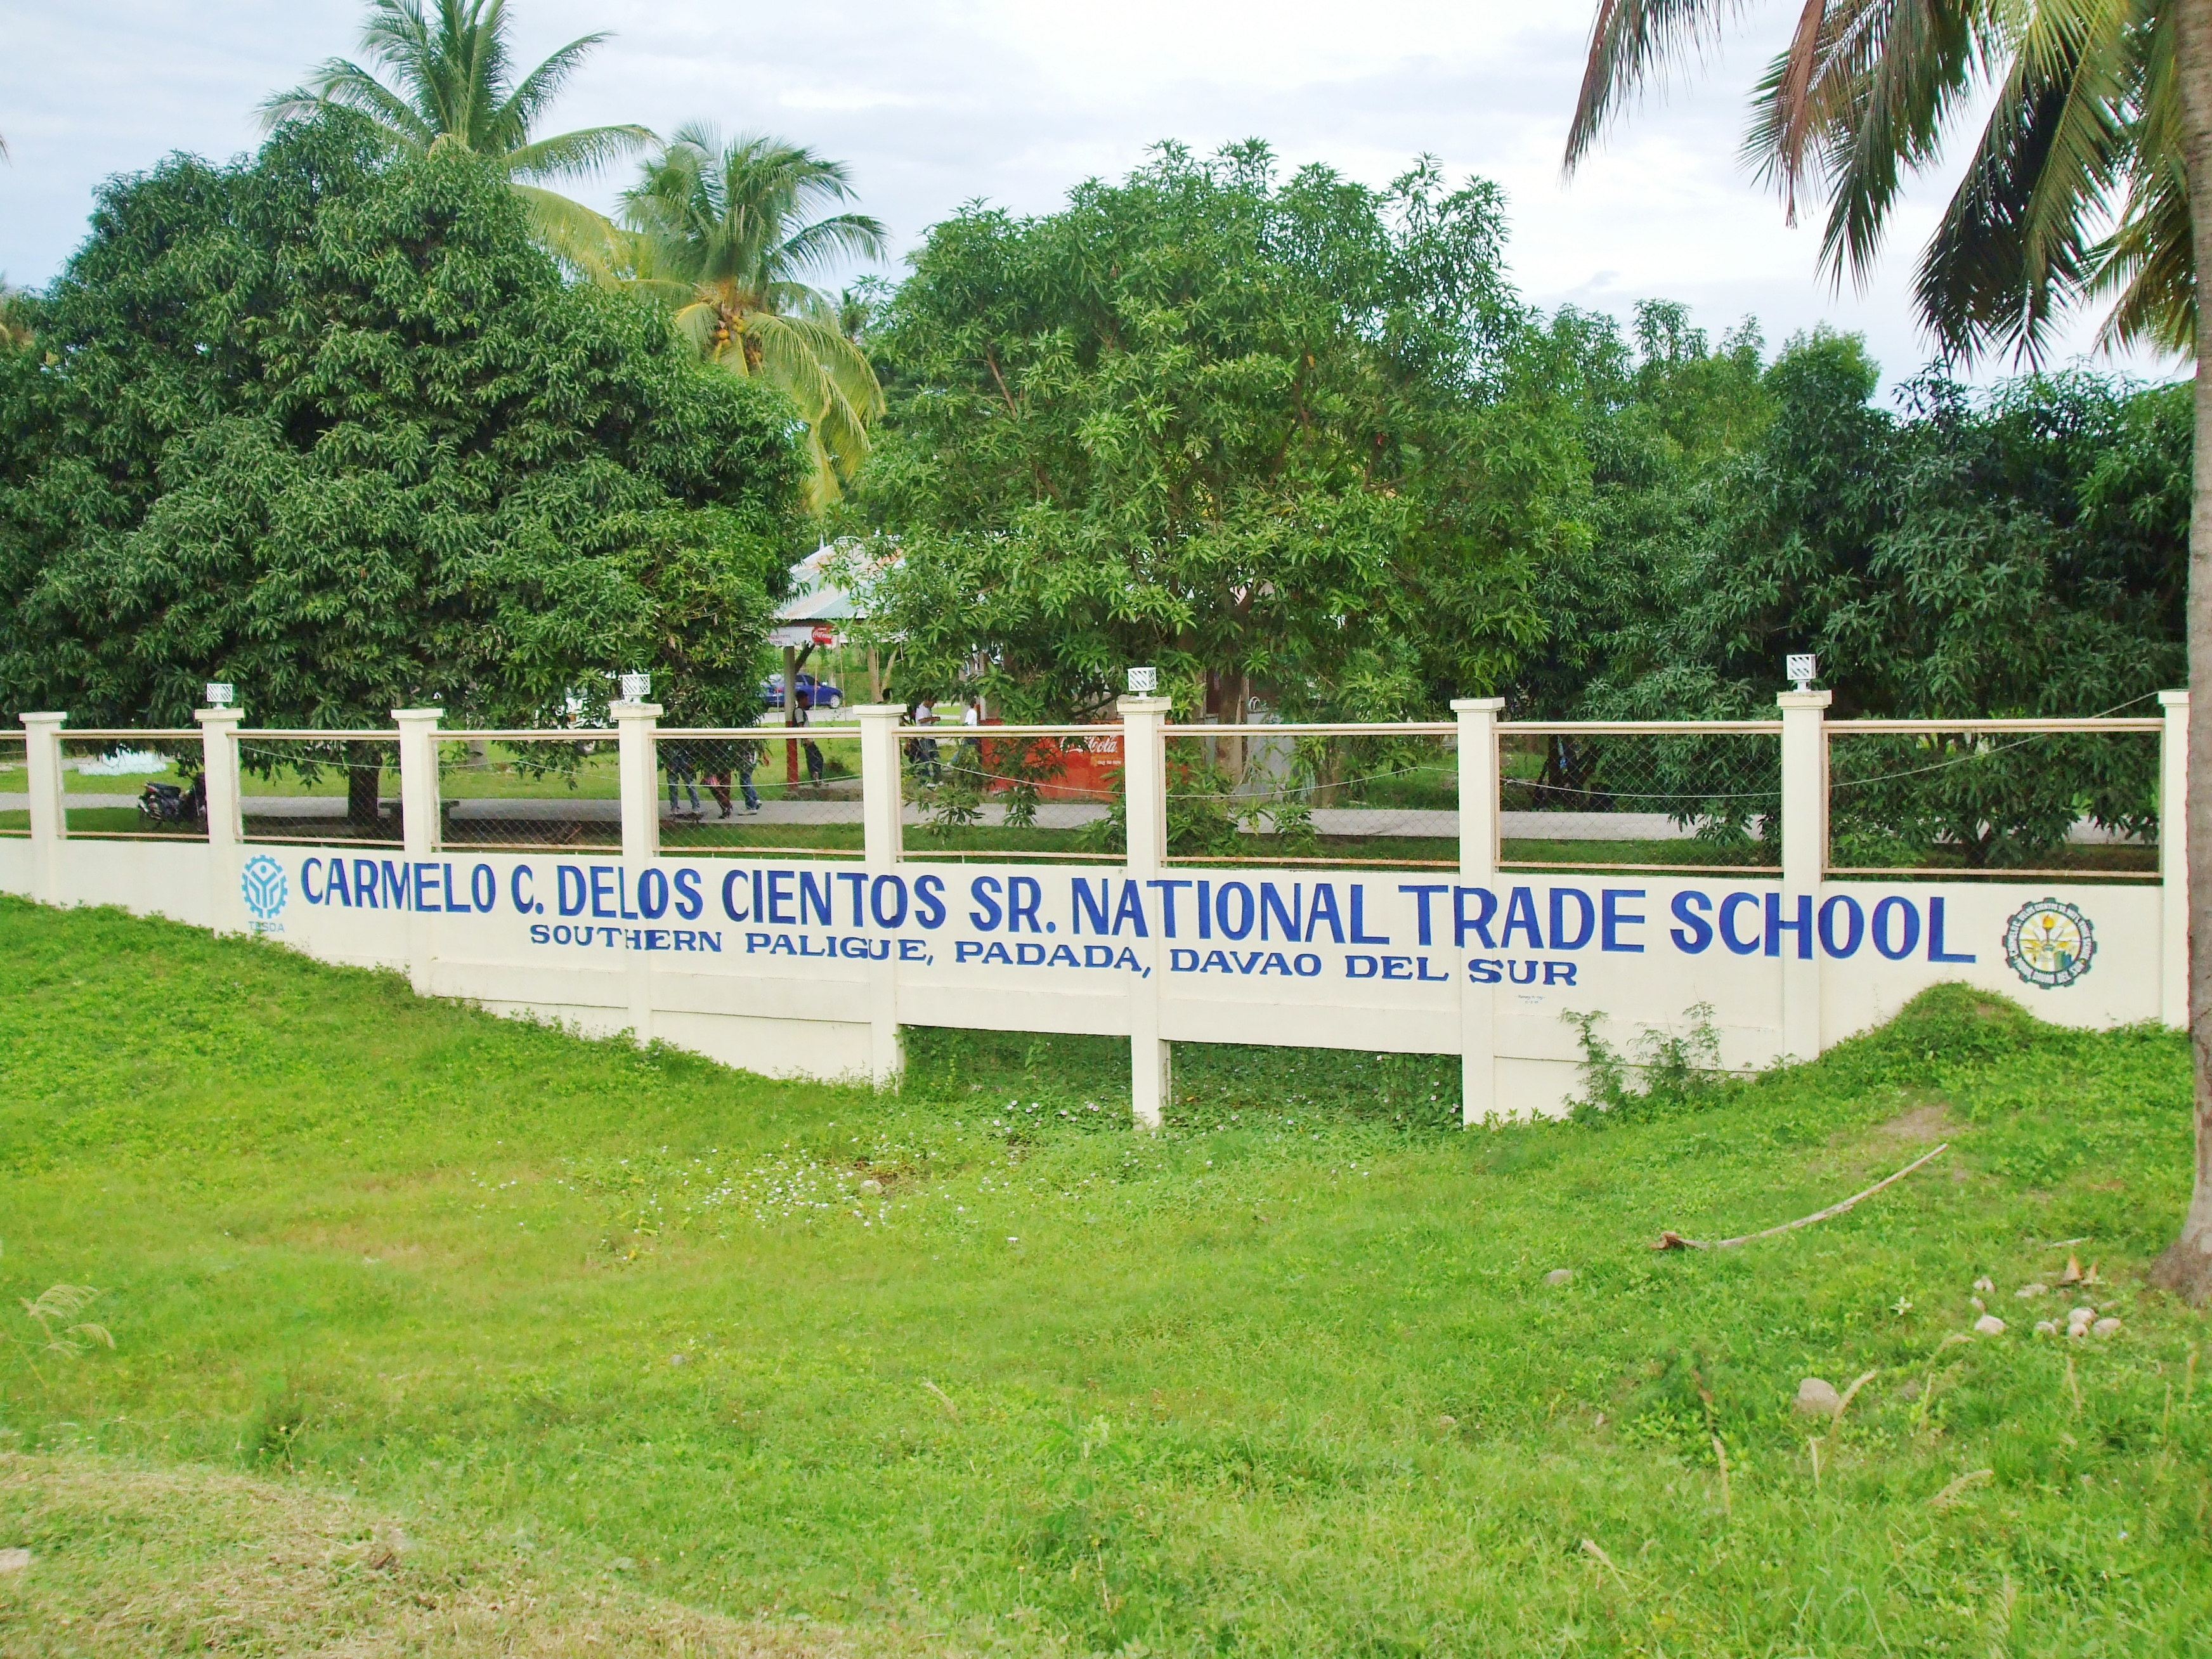 List of trade school options